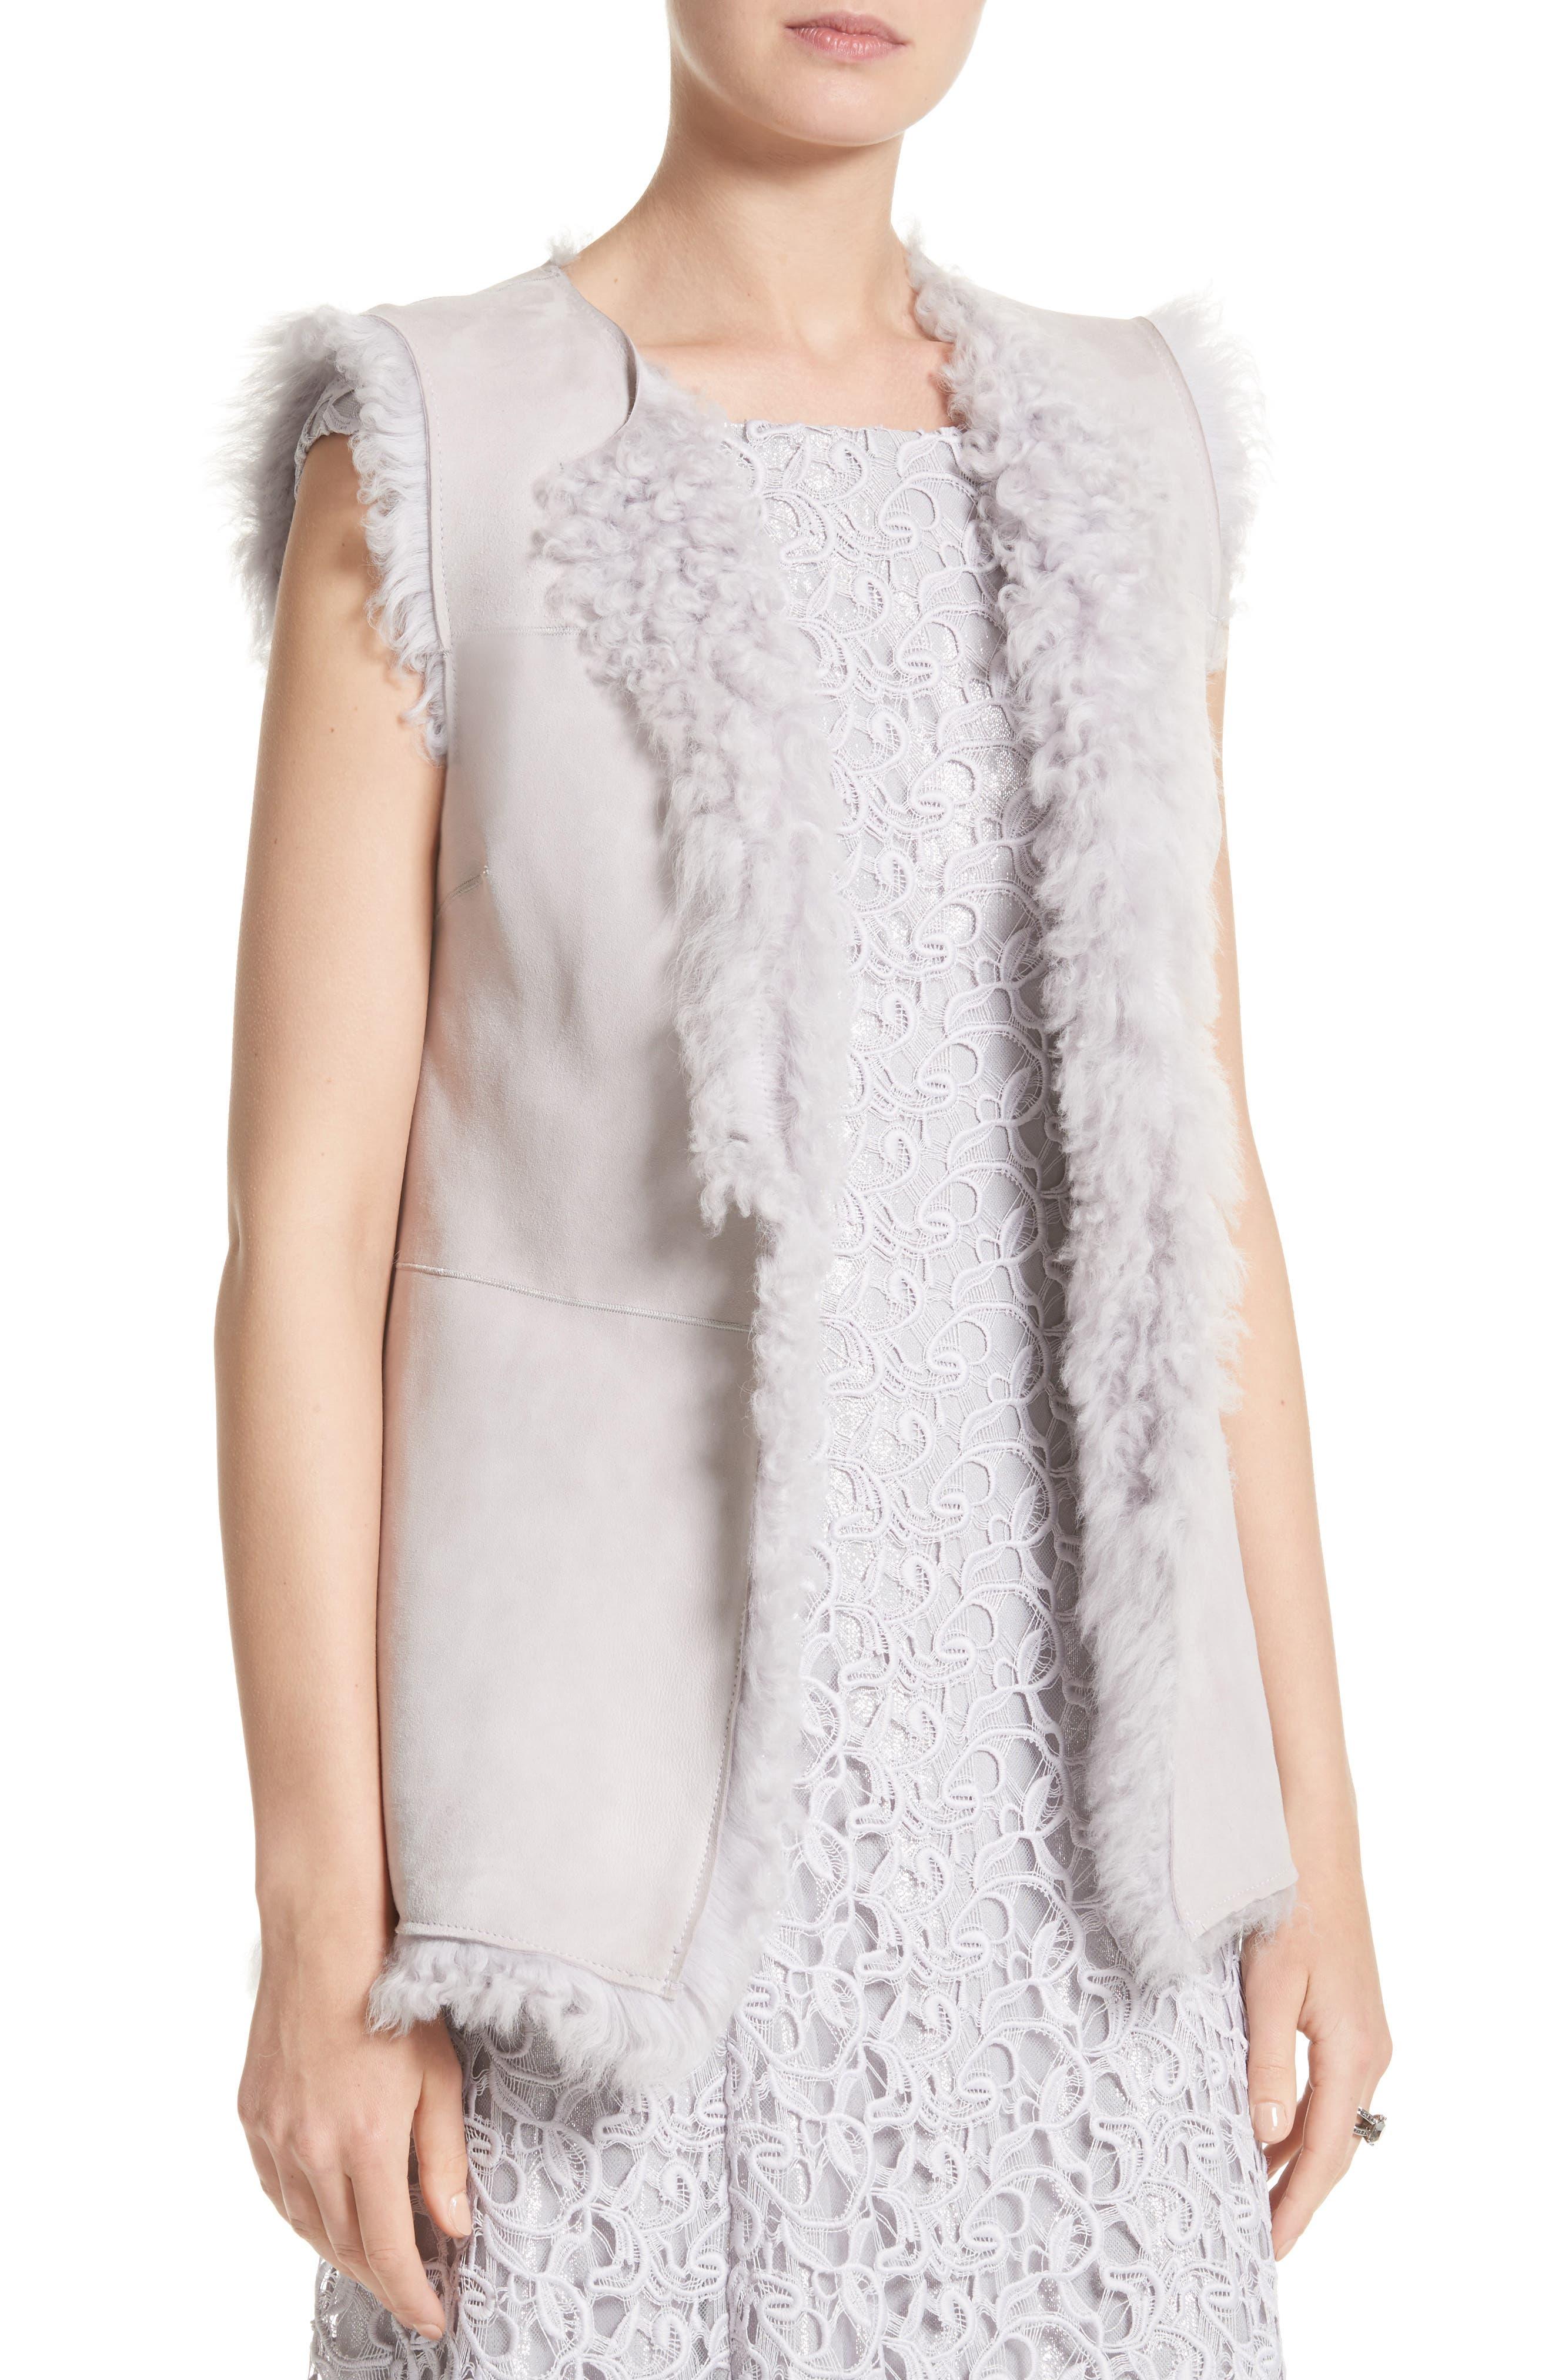 St John Collection Reversible Genuine Curly Lamb Fur Vest,                             Alternate thumbnail 2, color,                             500